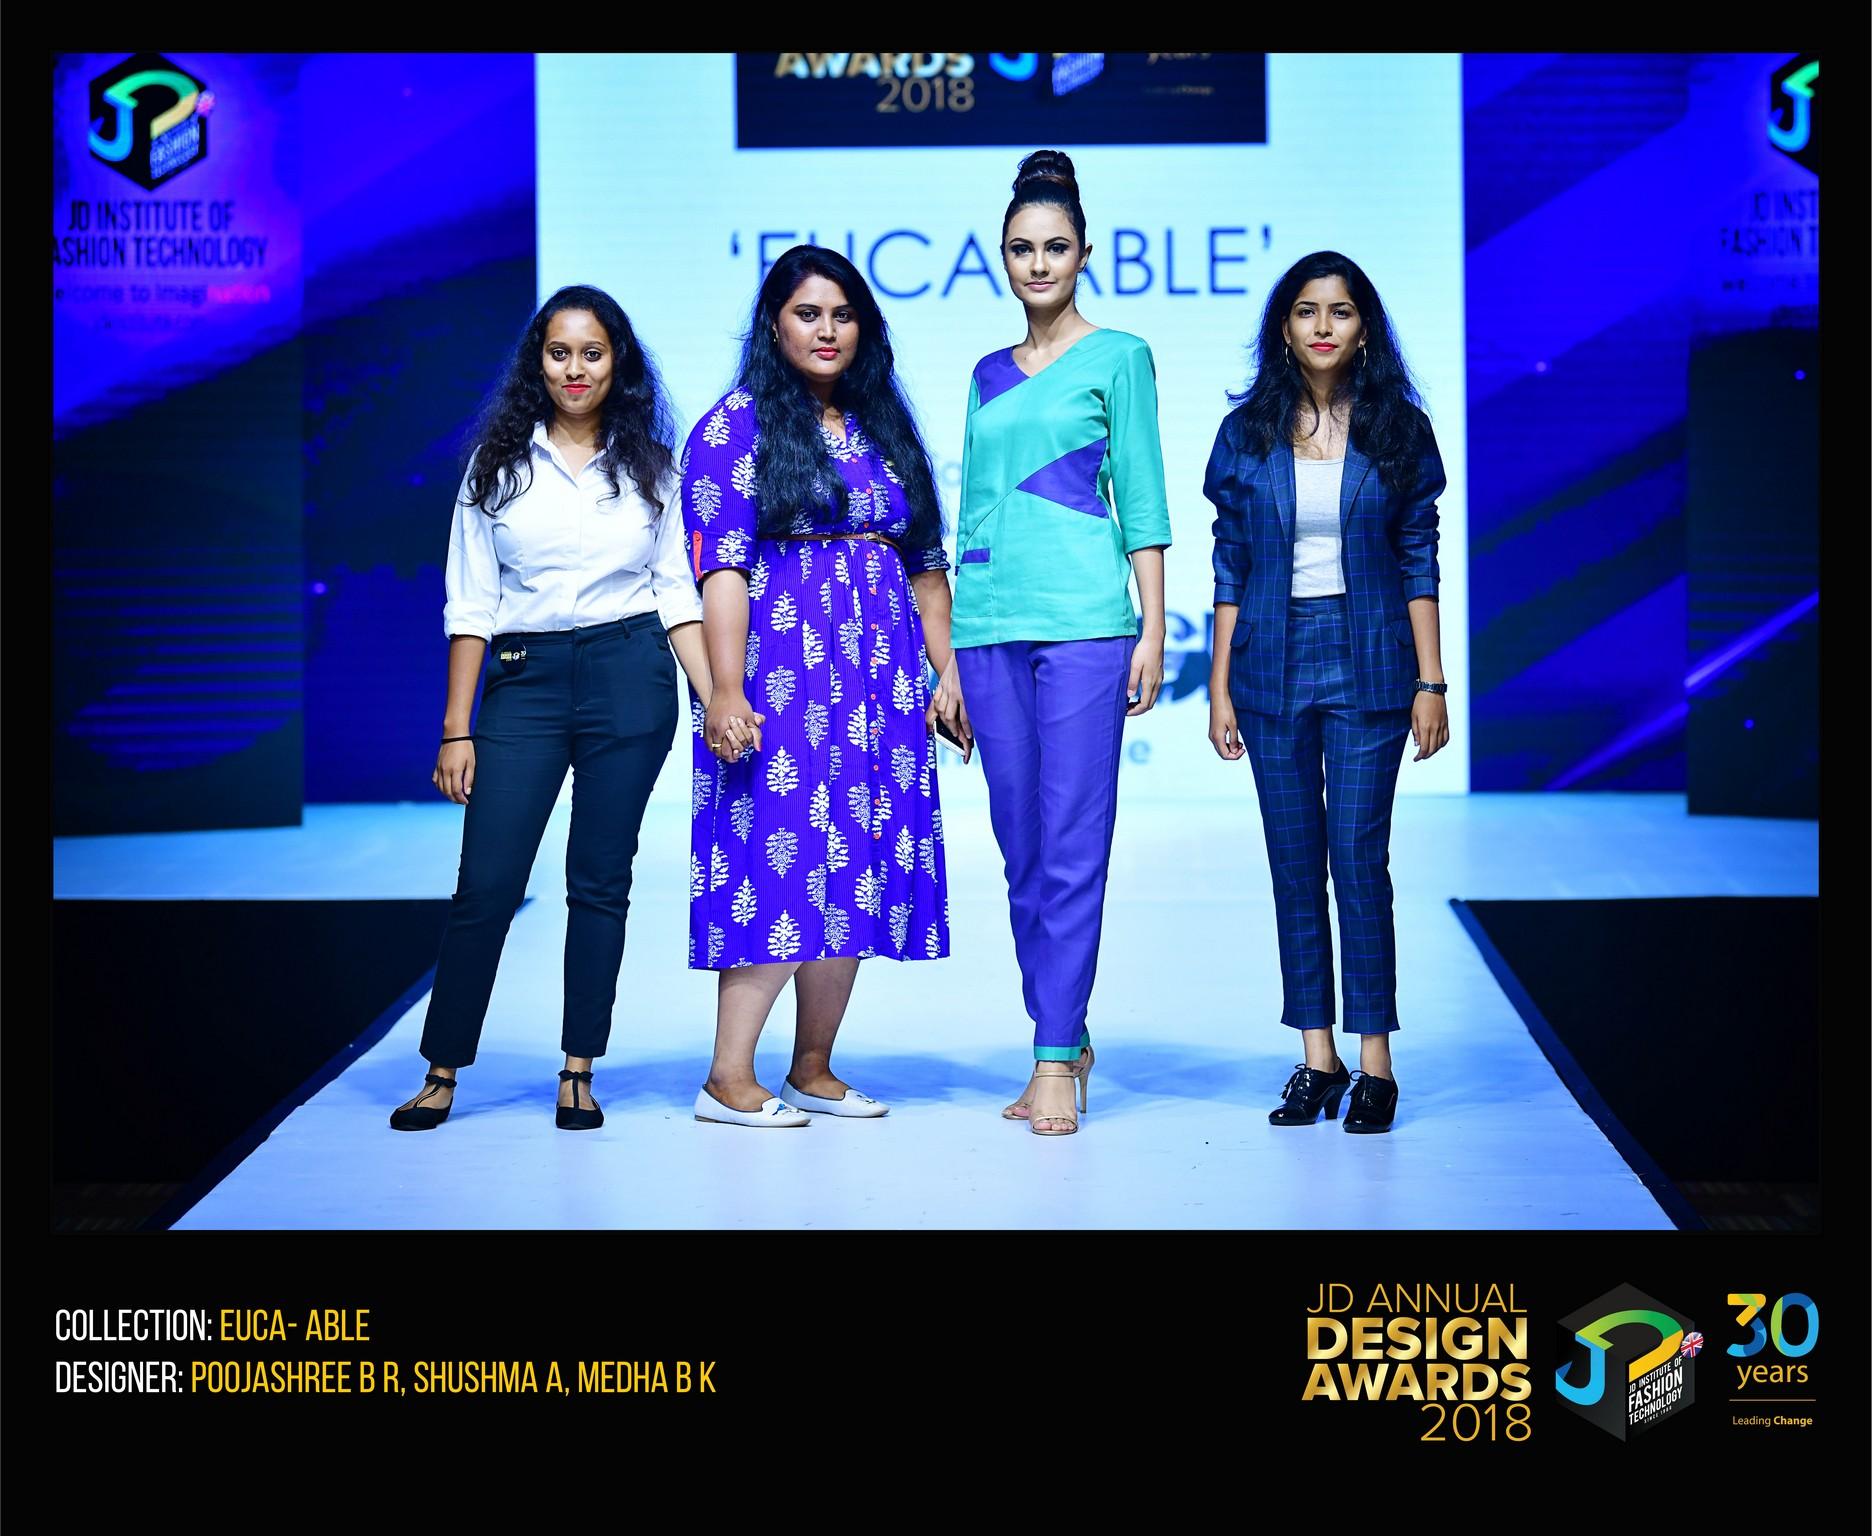 Euca-able – Change – JD Annual Design Awards 2018 | Designer: Poojashree, Sushma and Medha | Photography : Jerin Nath (@jerin_nath) euca-able - EUCA ABLE 8 - Euca-able – Change – JD Annual Design Awards 2018